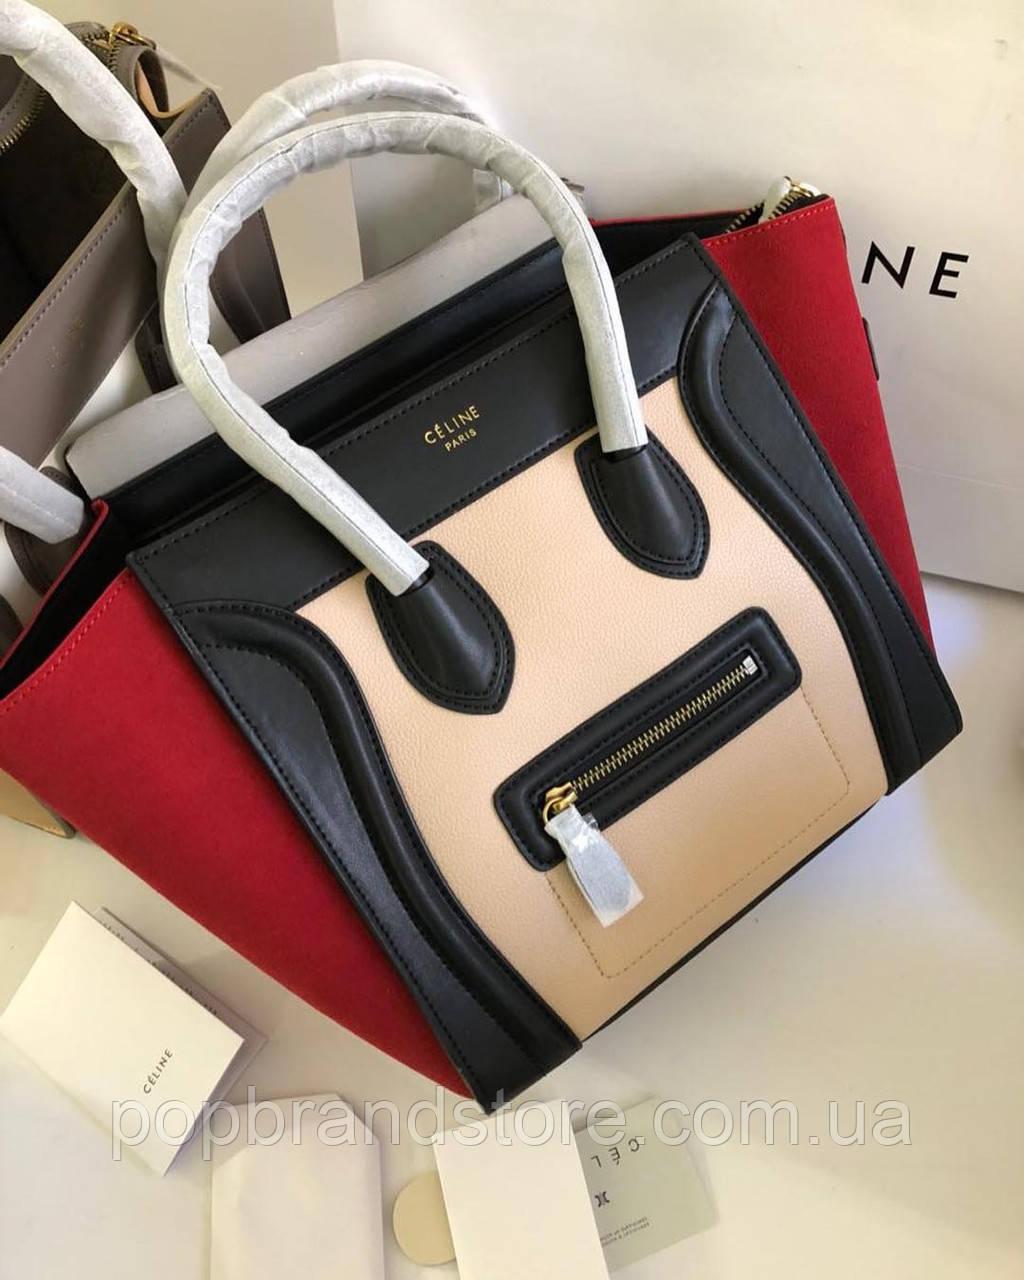 25865c392264 Женская кожаная сумка Celine бордо (реплика) - Pop Brand Store | брендовые  сумки,